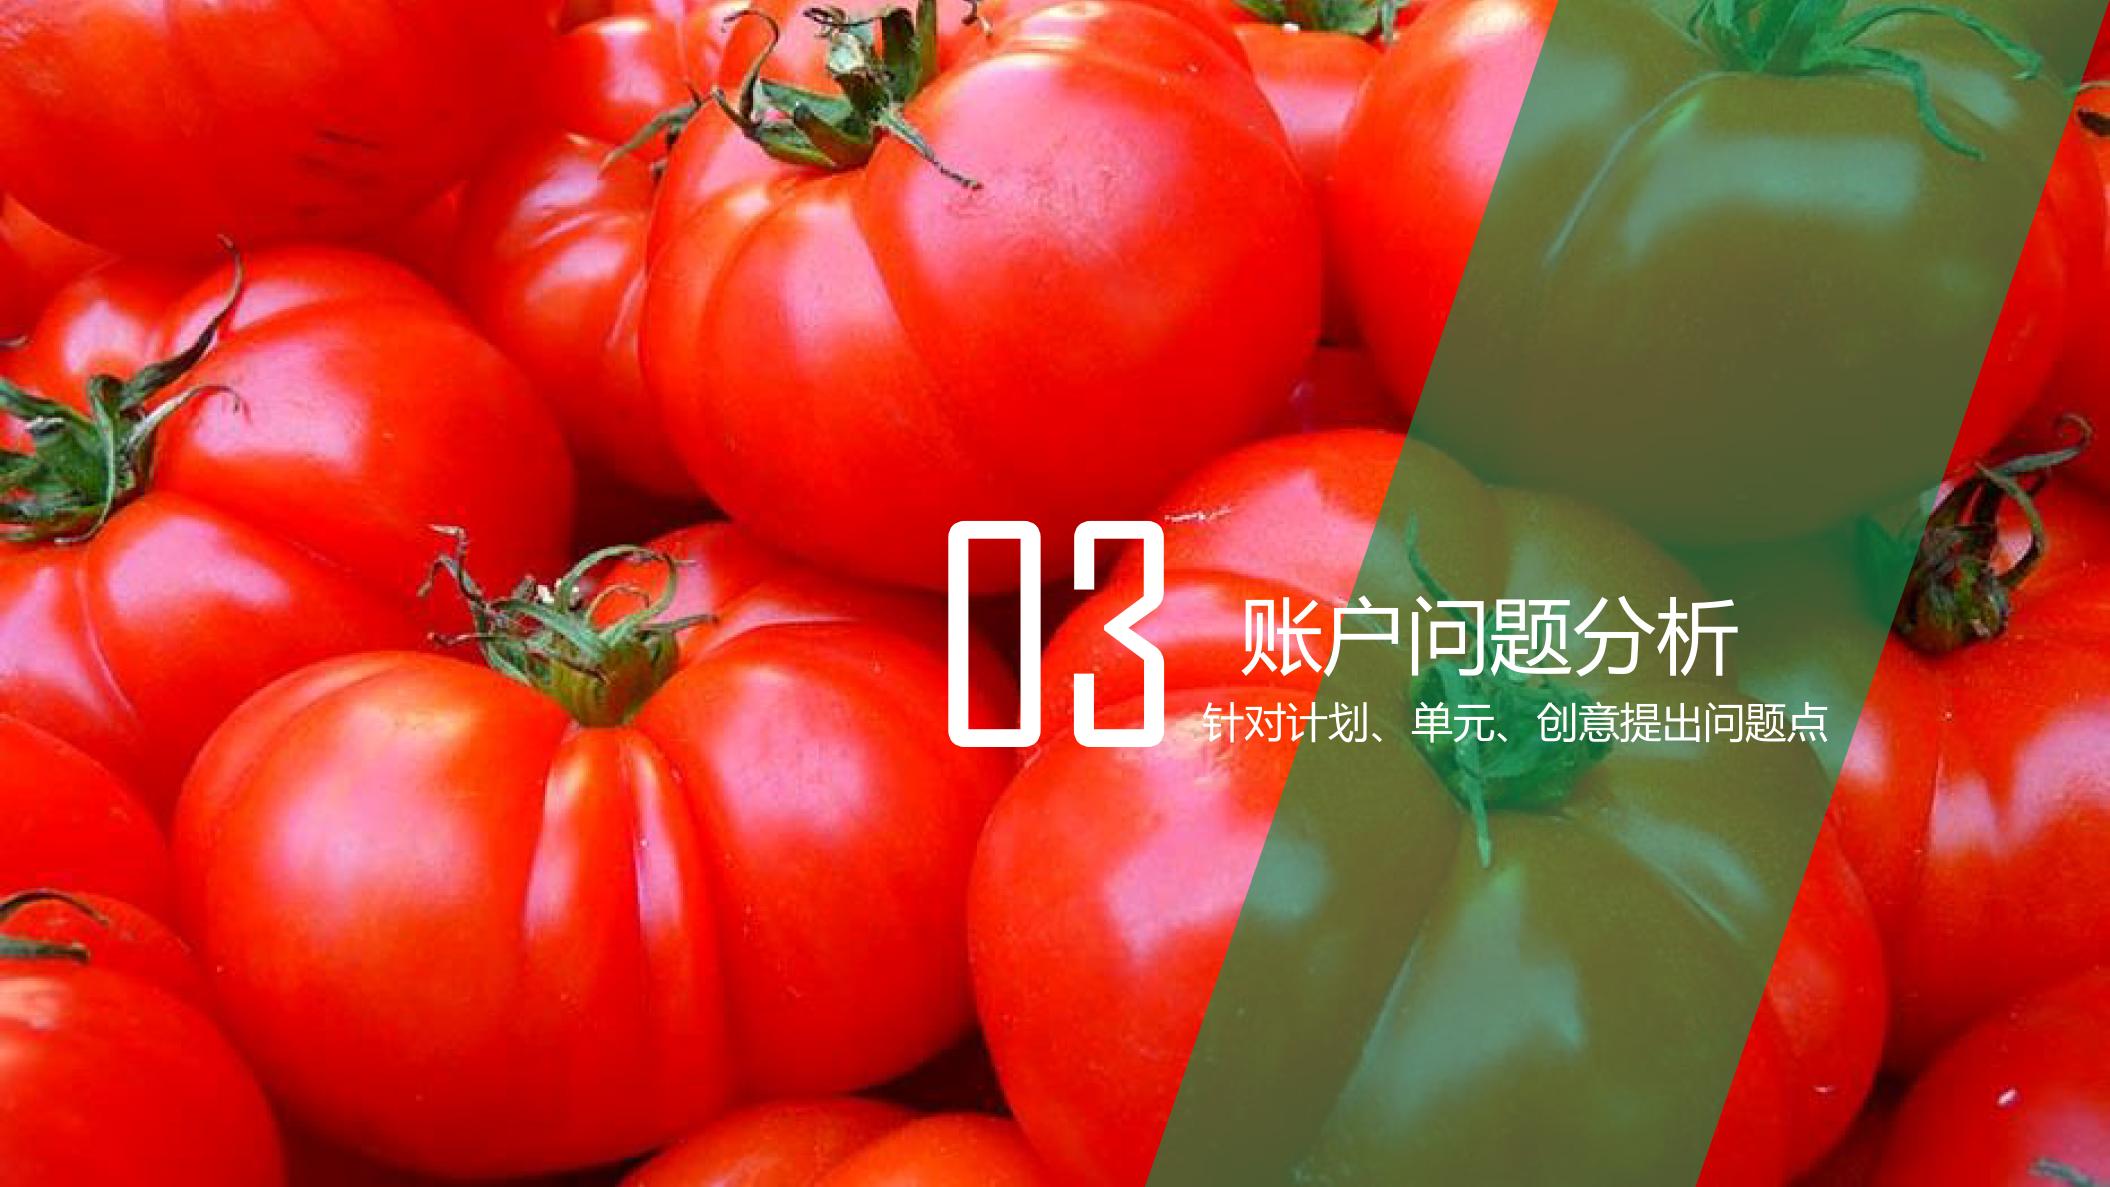 F1+vbj村小爱+软件游戏+张洁0608_10.png